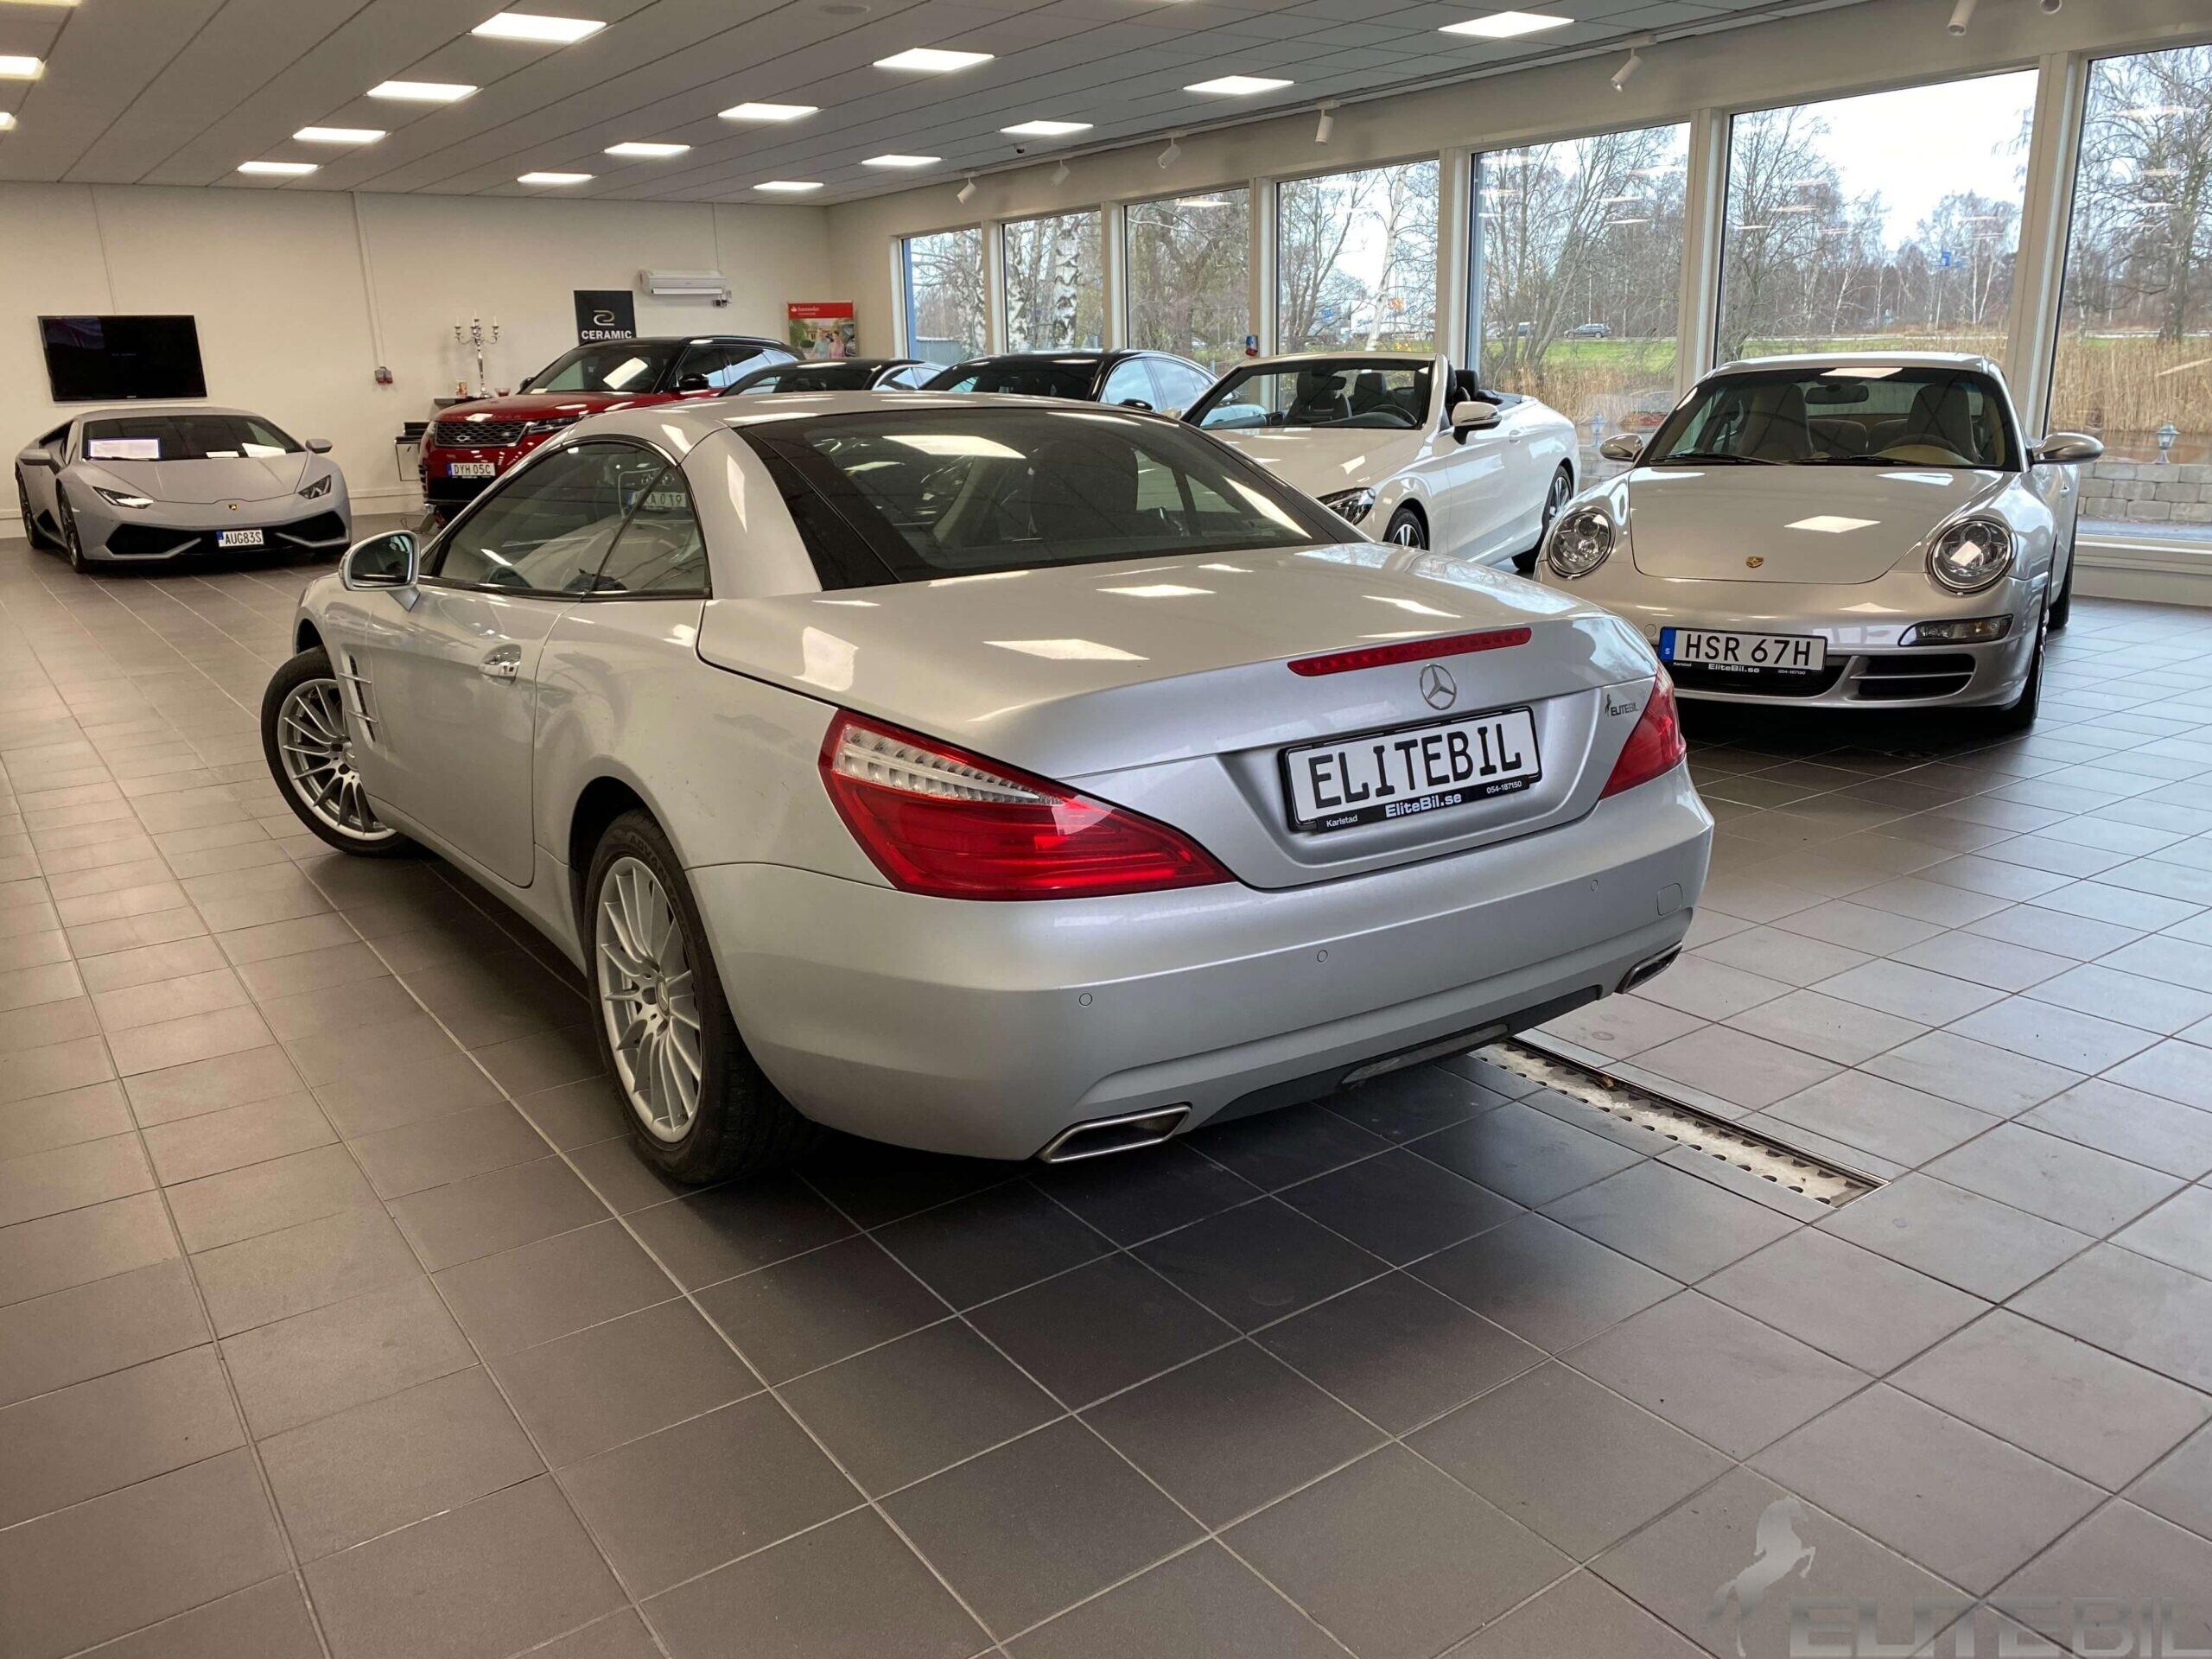 Mercedes-Benz SL 350 7G-Tronic 306hk Bör Ses (1)